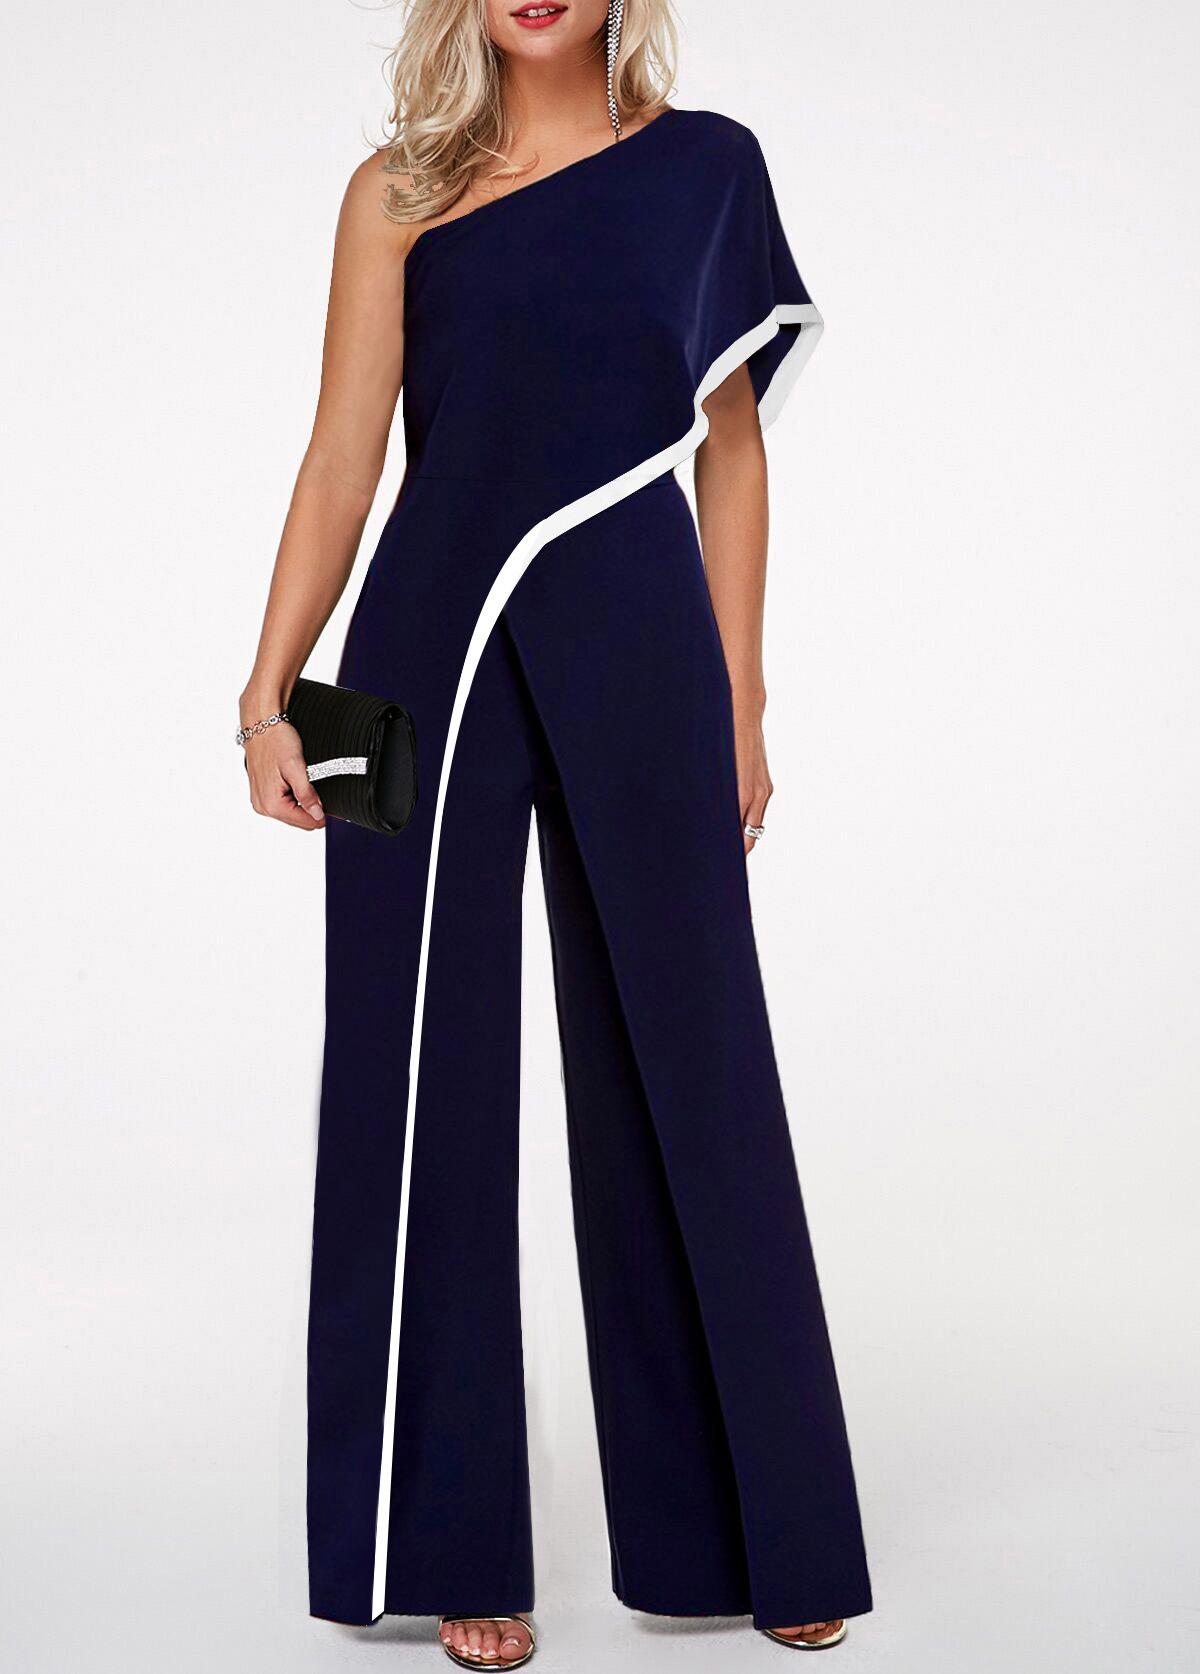 One Shoulder Navy Blue Contrast Trim Jumpsuit